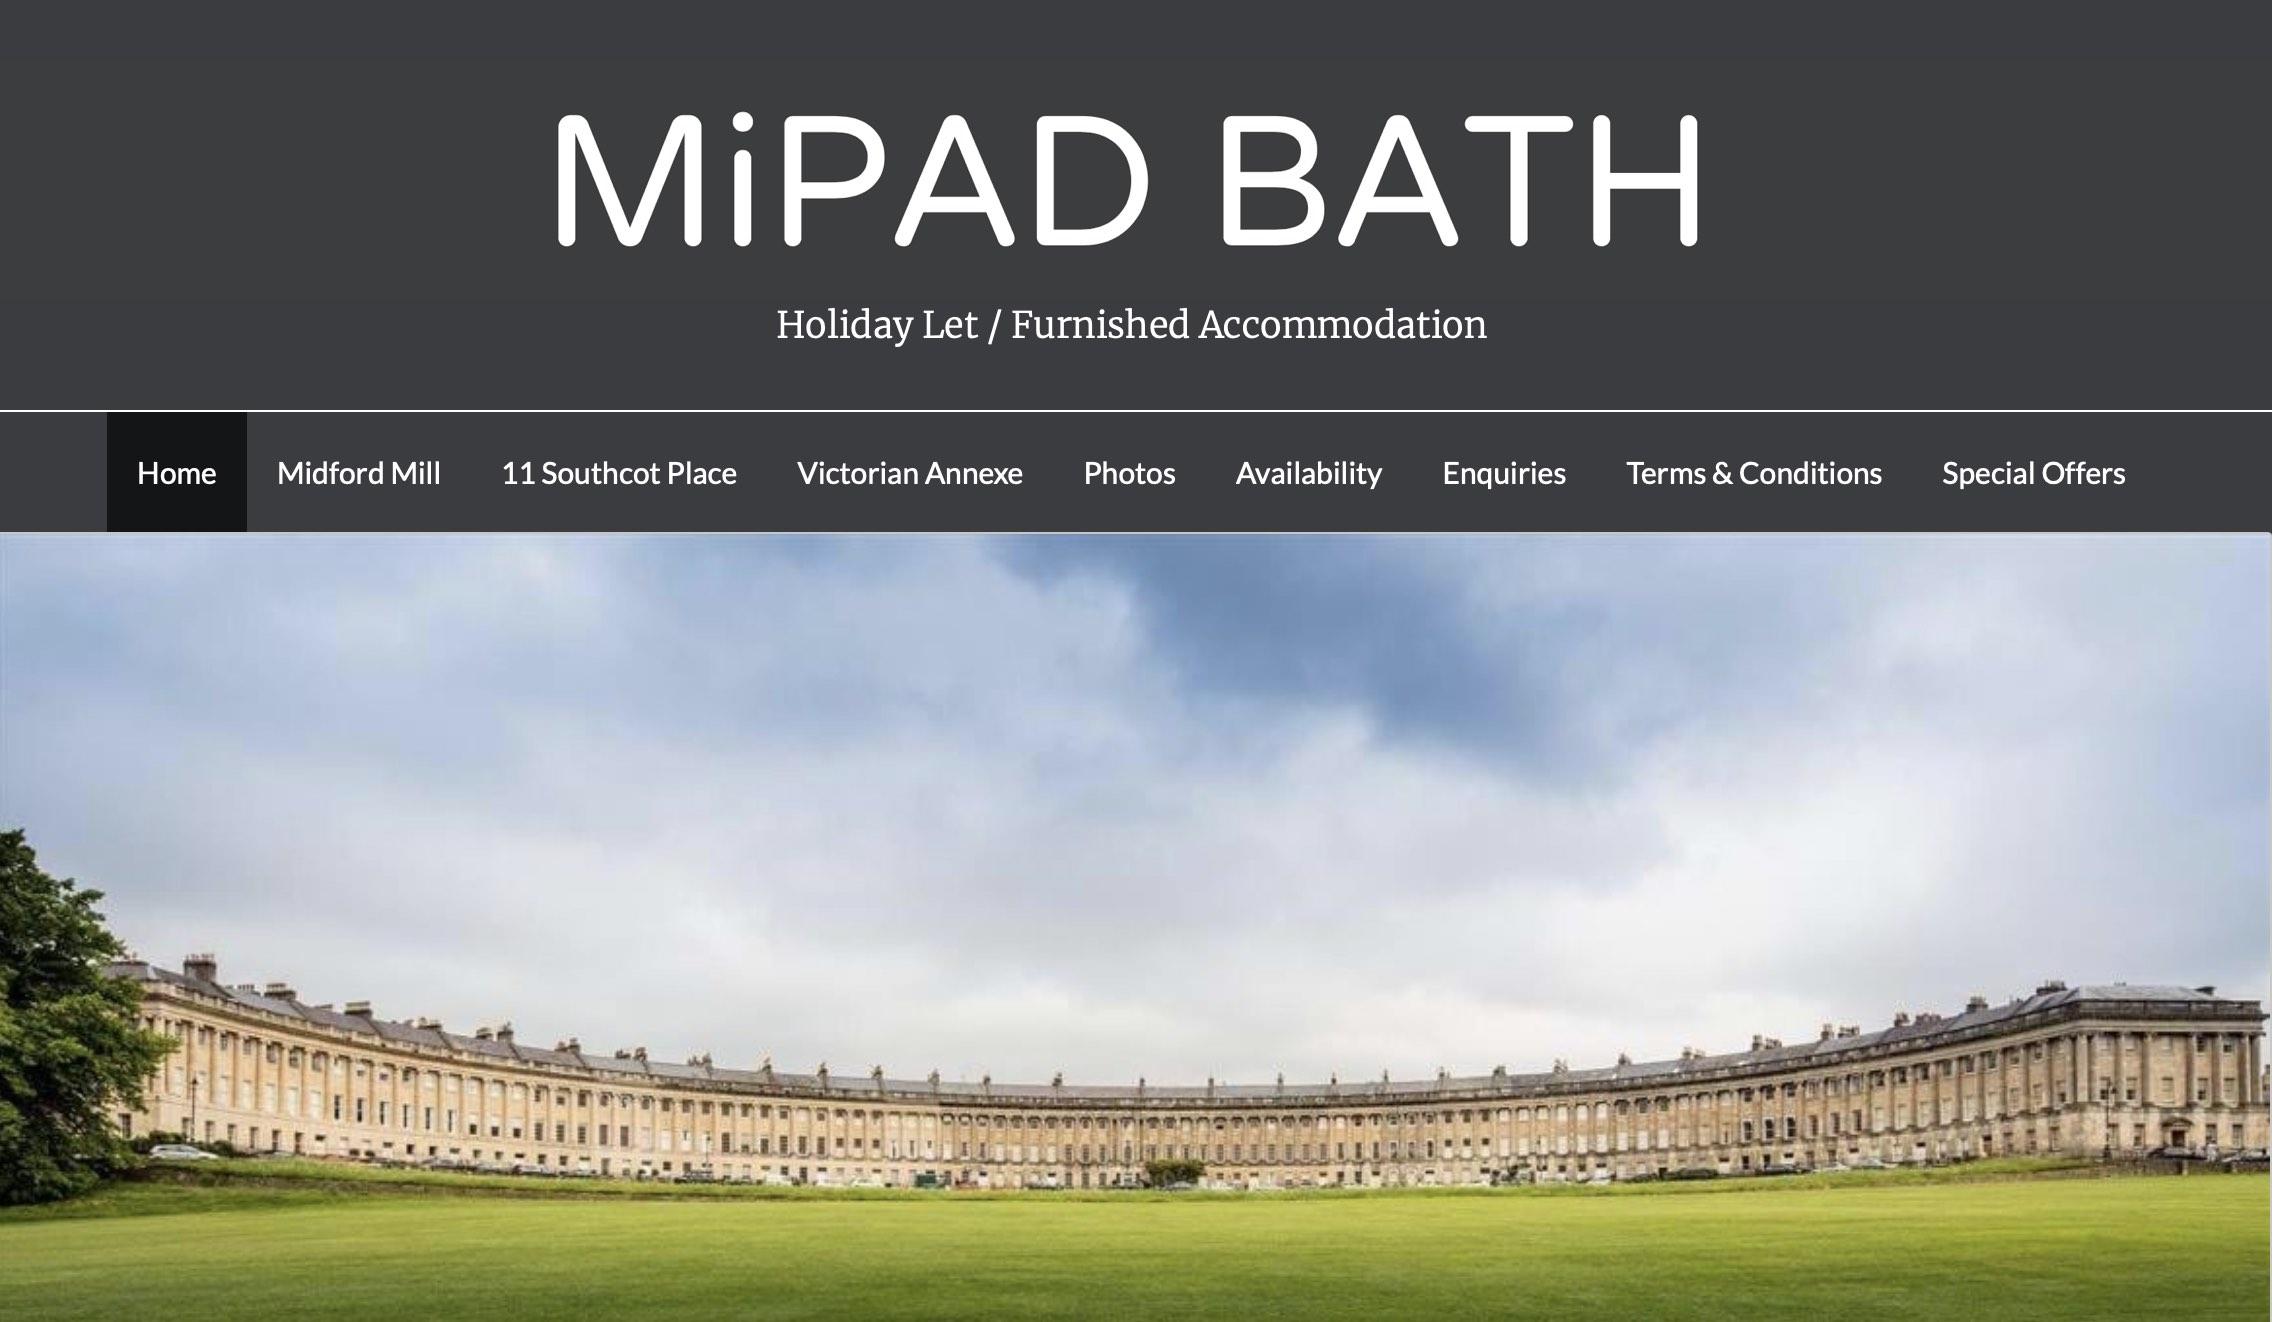 MiPAD BATH